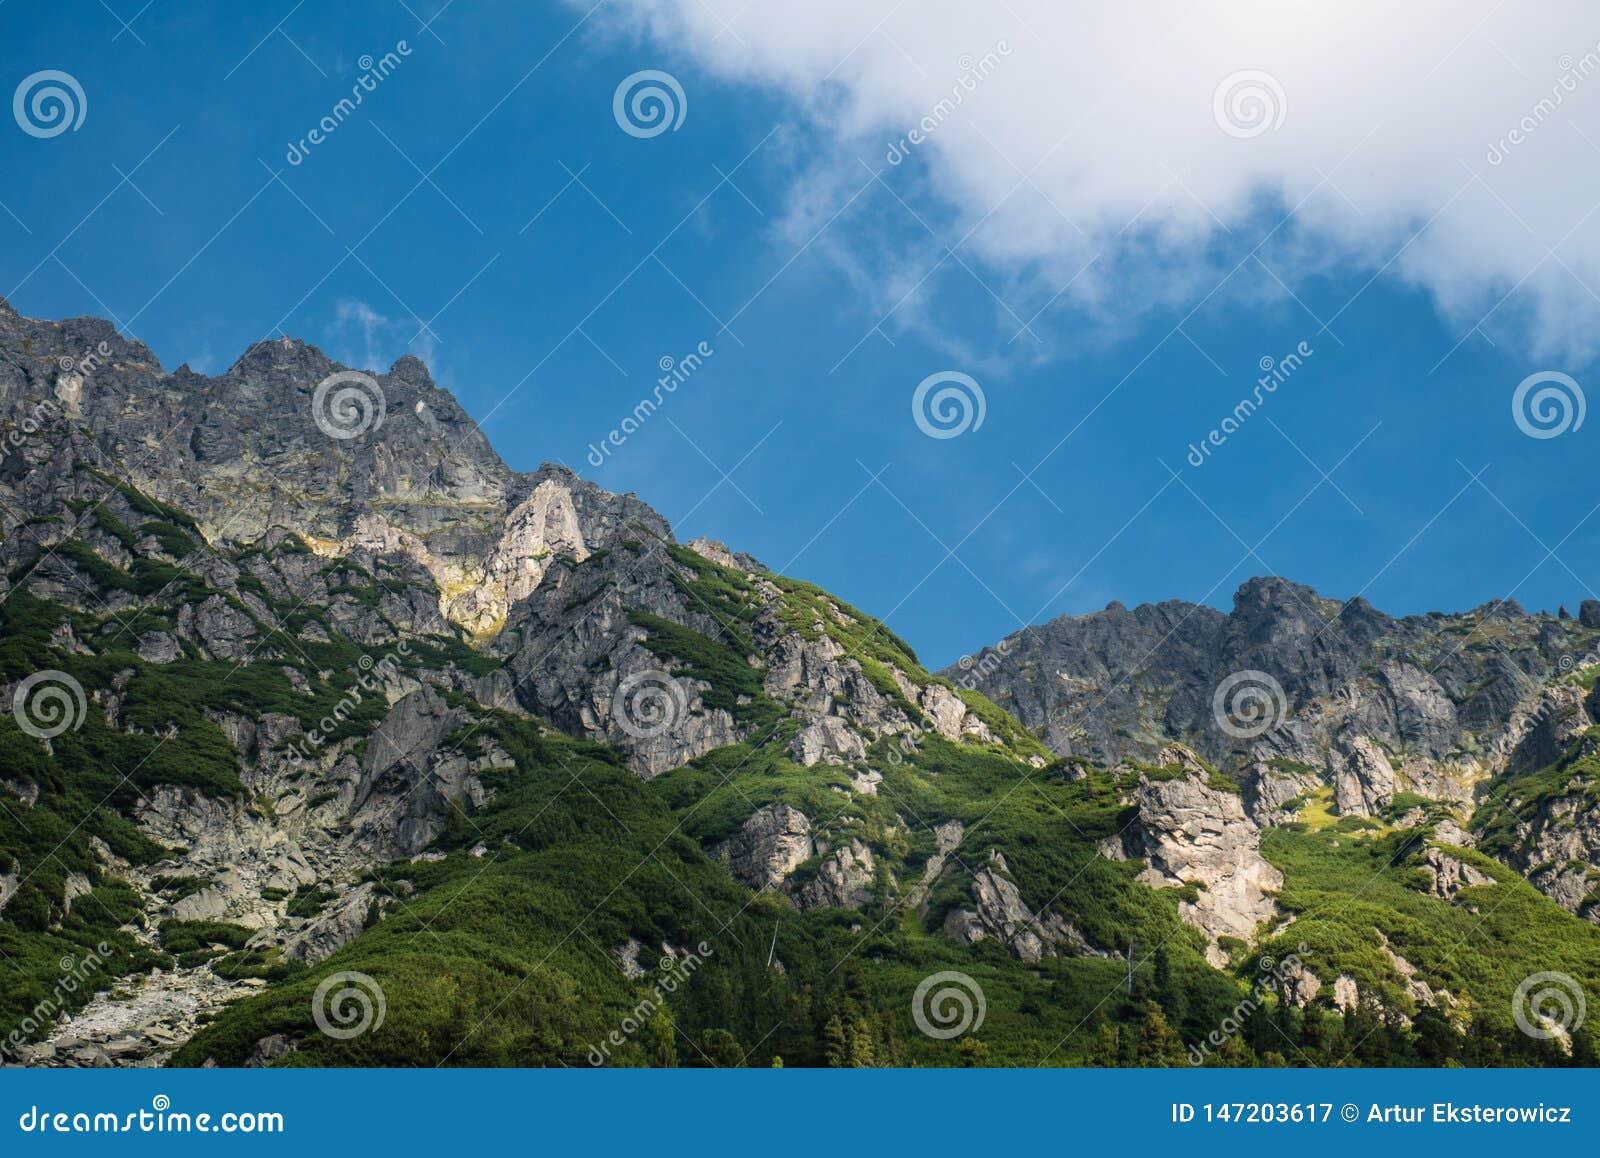 Mountain landscape of Tatra mountains